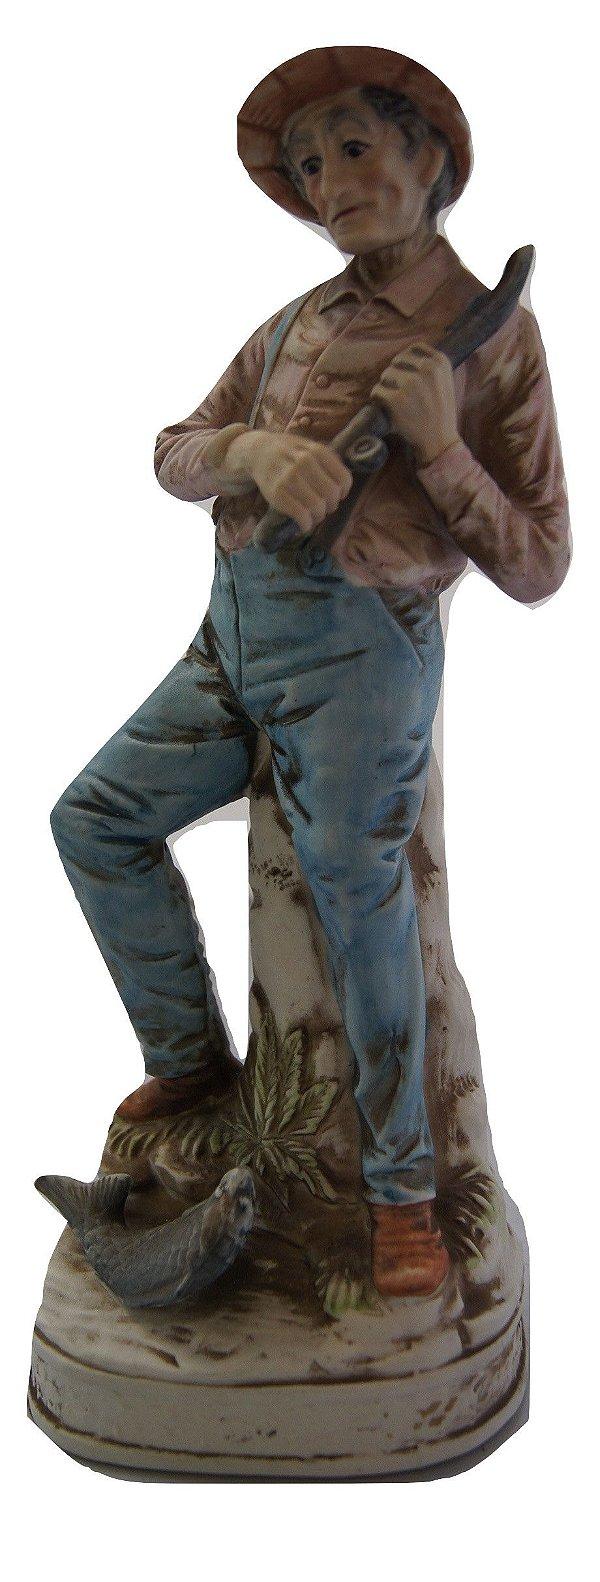 Escultura Estátua Bibelô De Porcelana Pescador